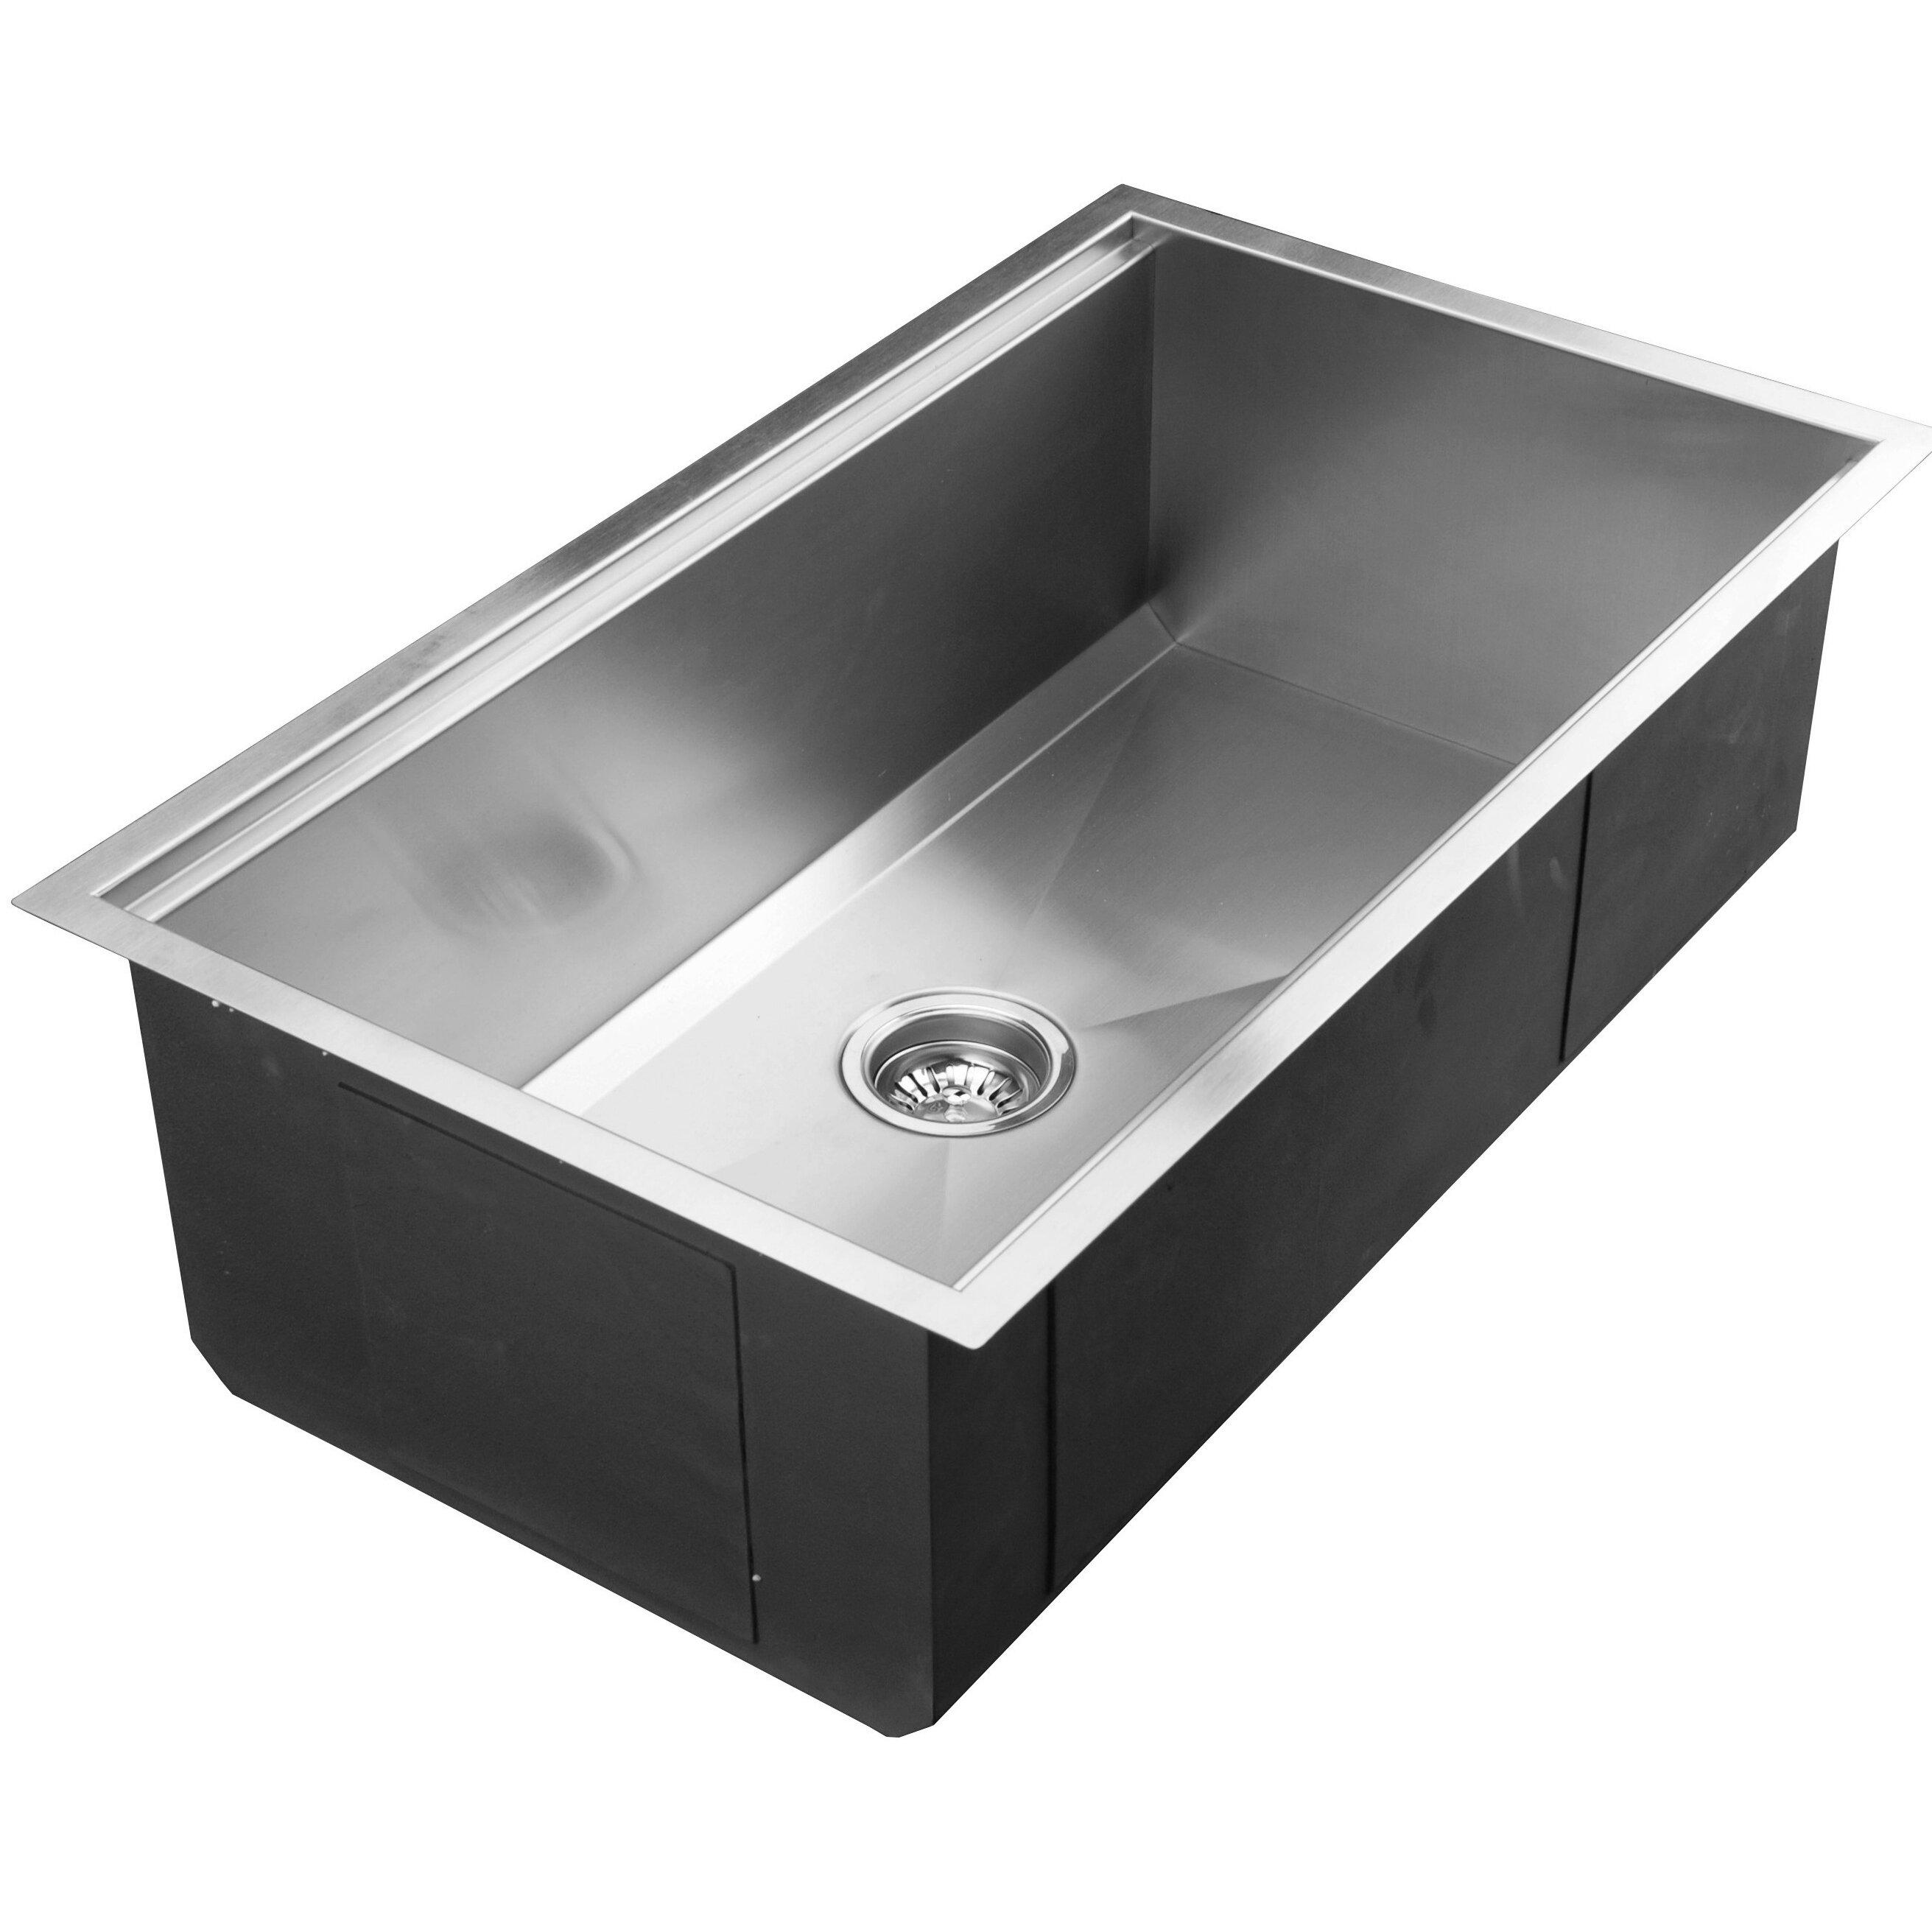 Ukinox 32 X 18 5 Undermount Single Bowl Stainless Steel Kitchen Sink